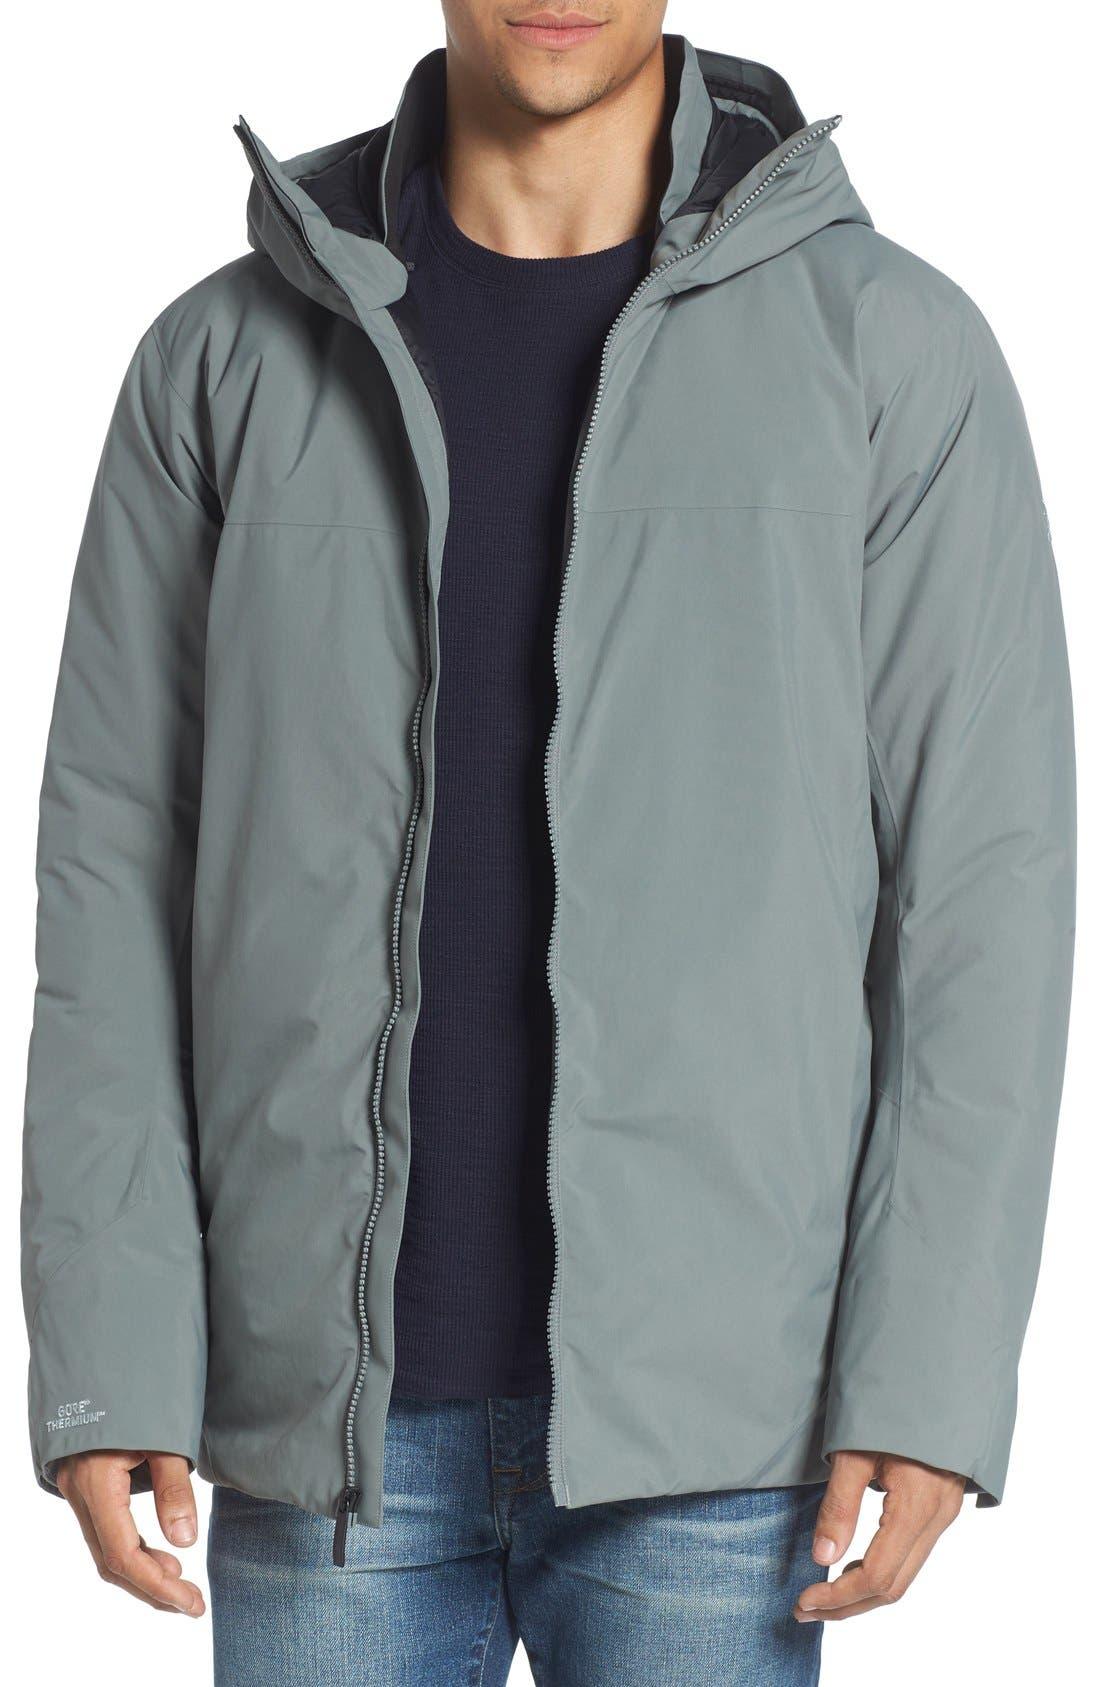 Main Image - Arc'teryx 'Koda' Hooded Waterproof Shell Jacket